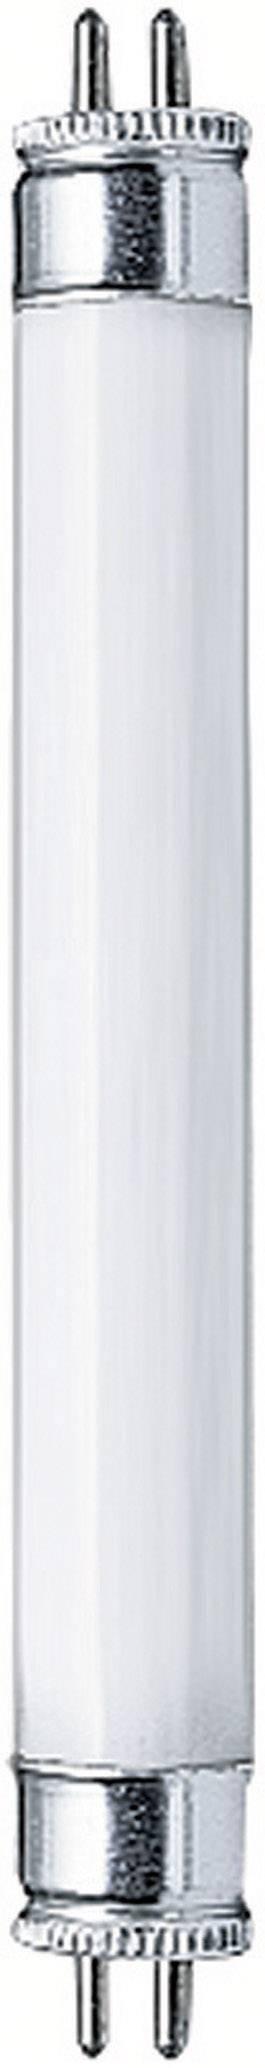 Úsporná zářivka Paulmann, 4 W, G5, 136 mm, teplá bílá